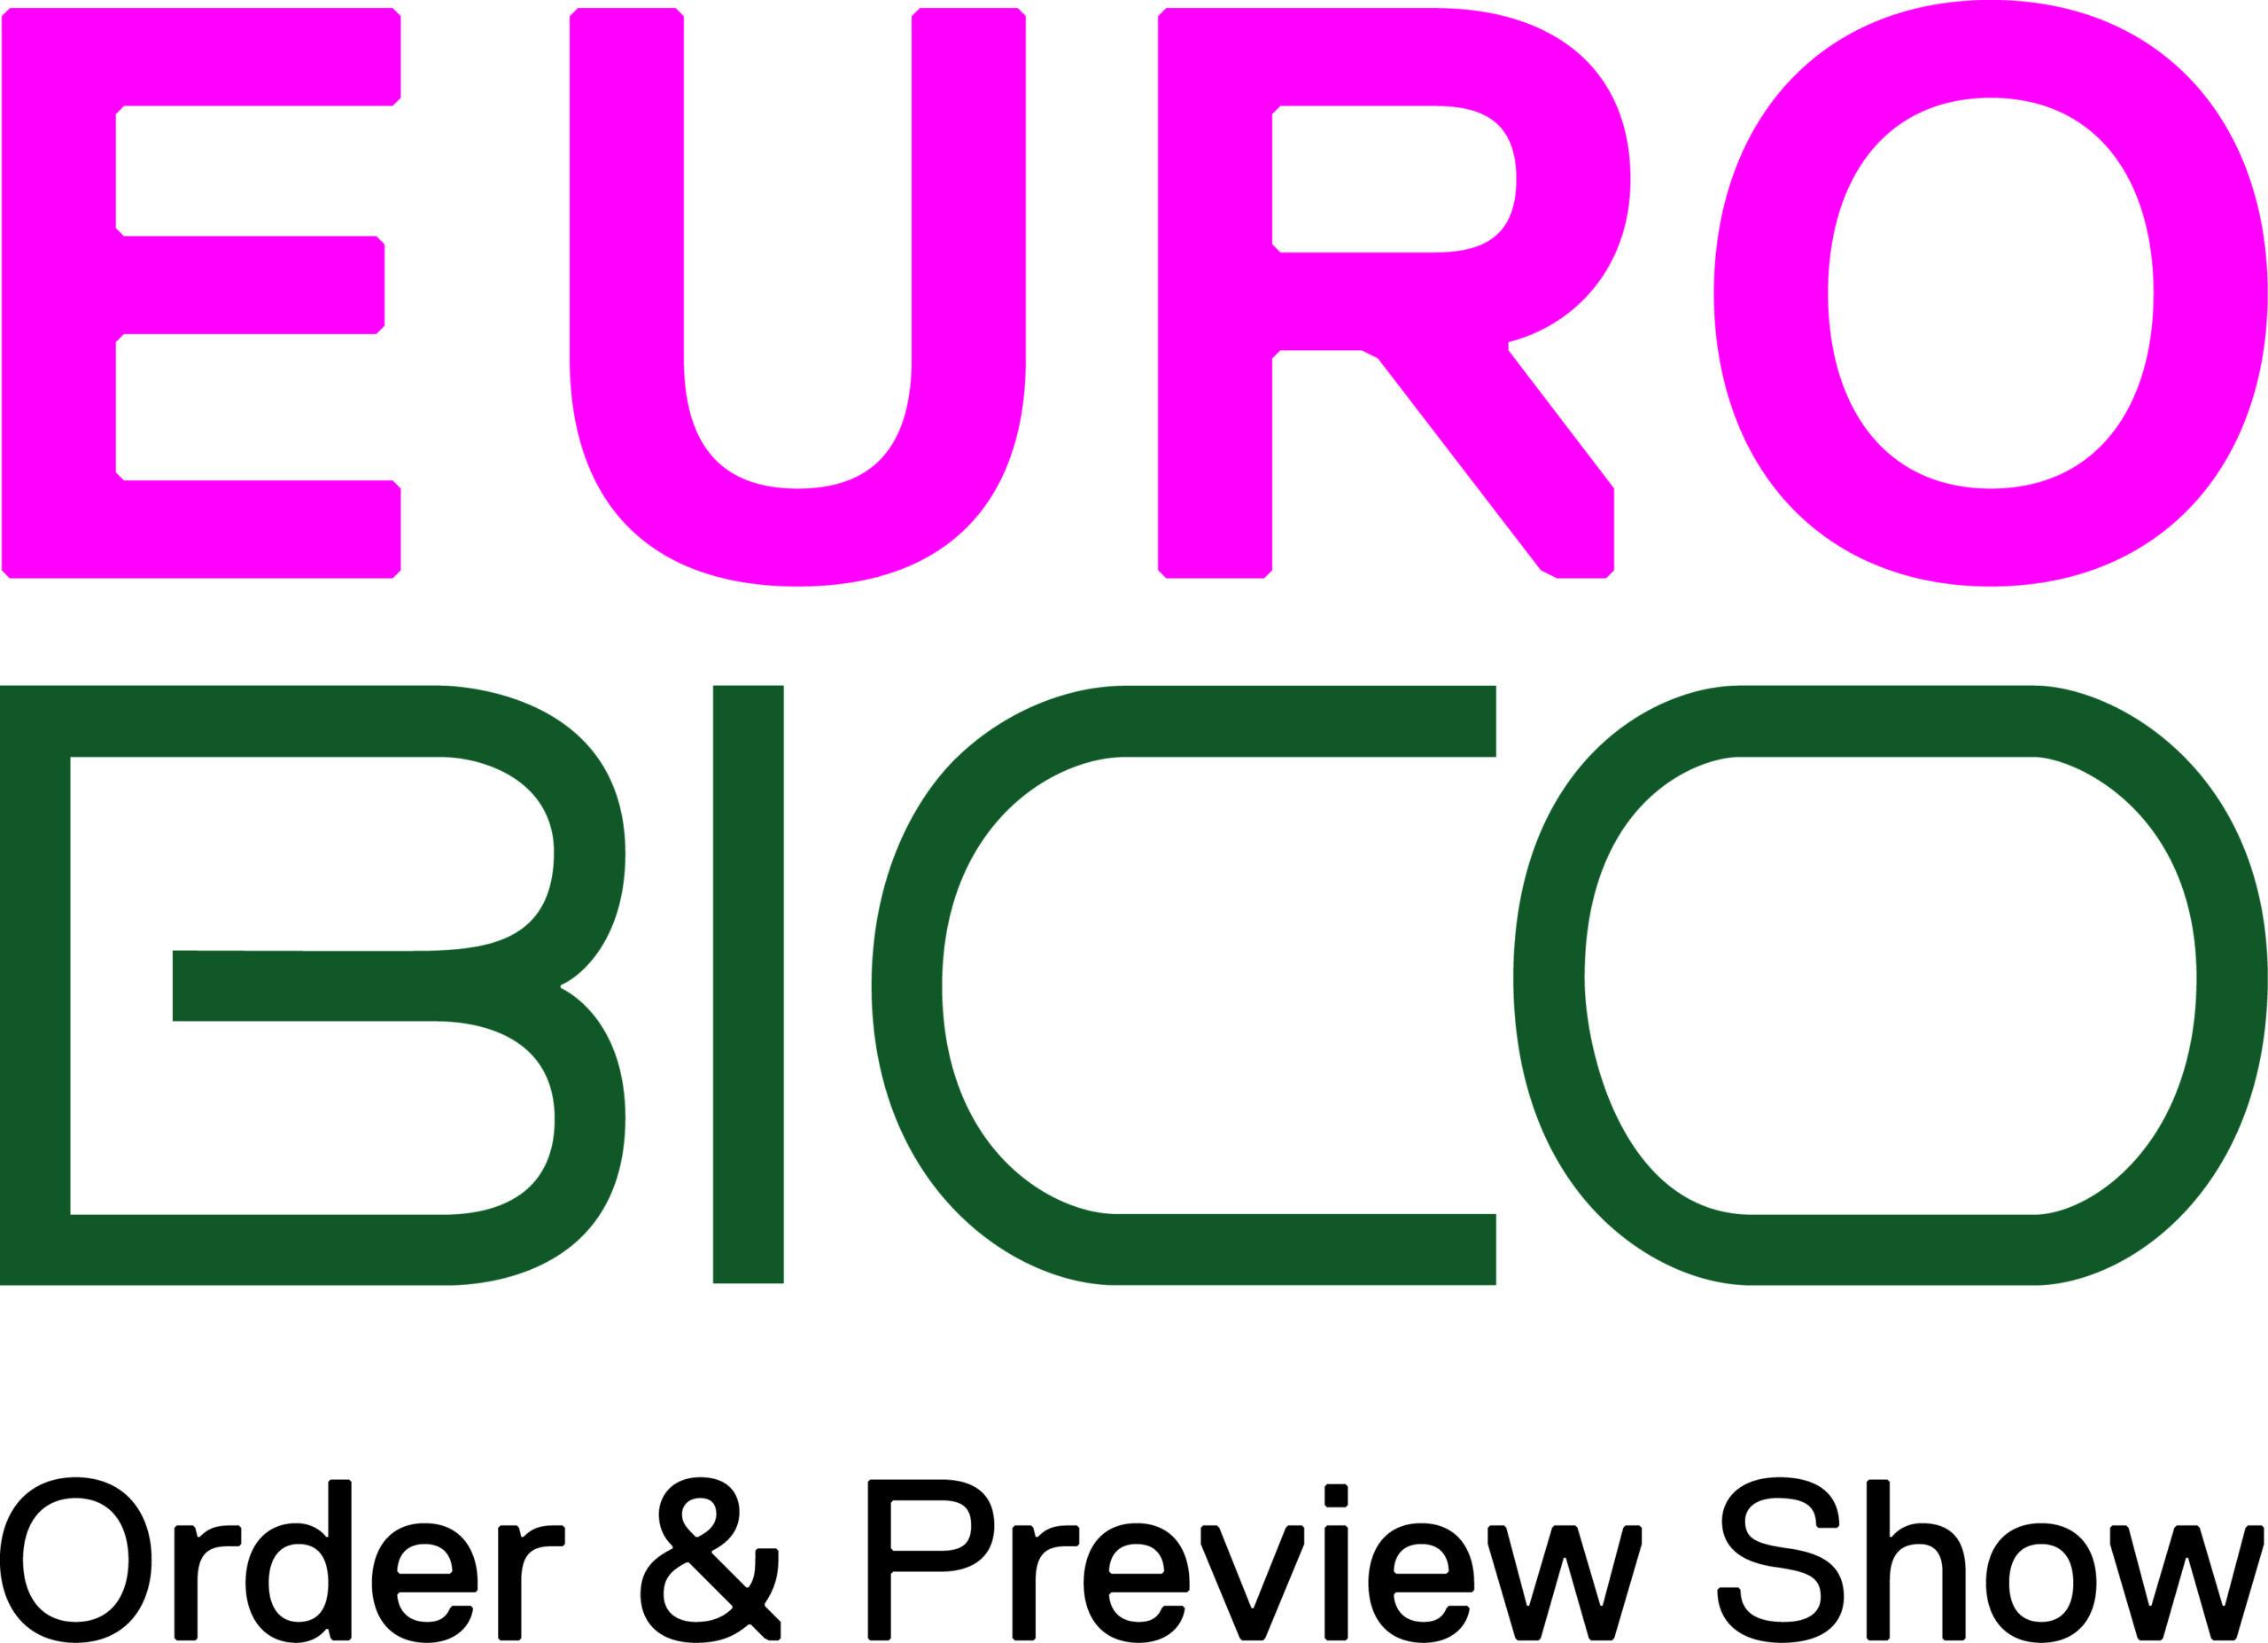 Eurobico-Logo (Fotos: Messe Friedrichshafen)